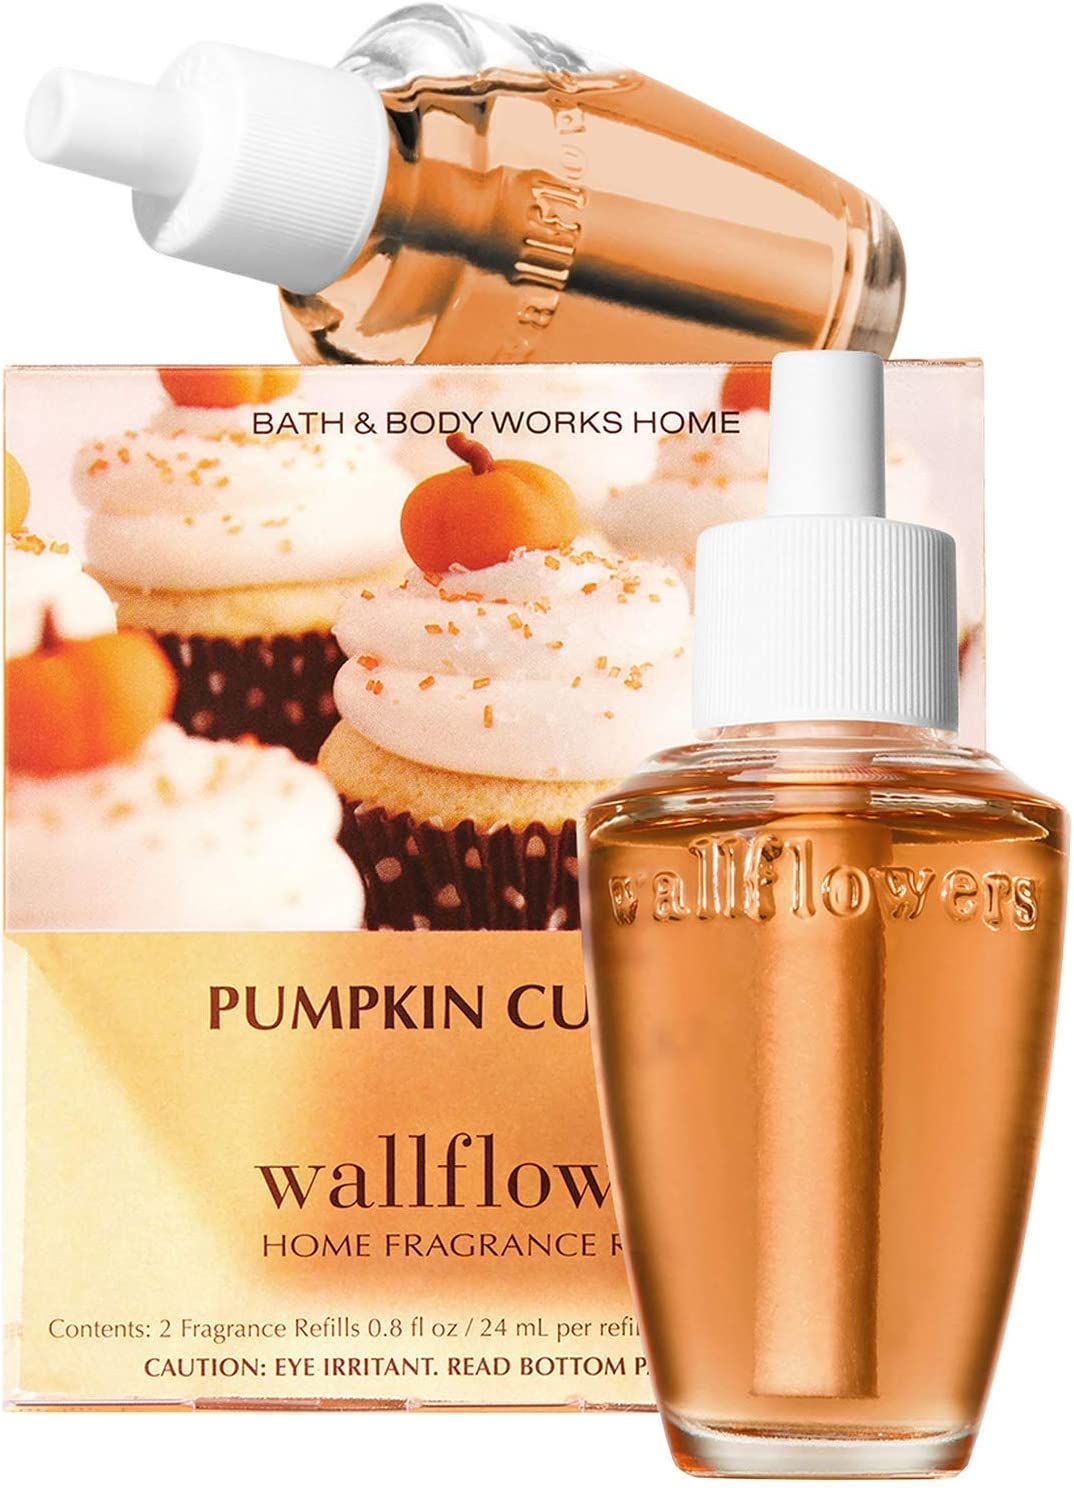 Bath & Body Works Pumpkin Cupcake Wallflowers Home Fragrance Refills, 2-Pack (1.6 fl oz total)